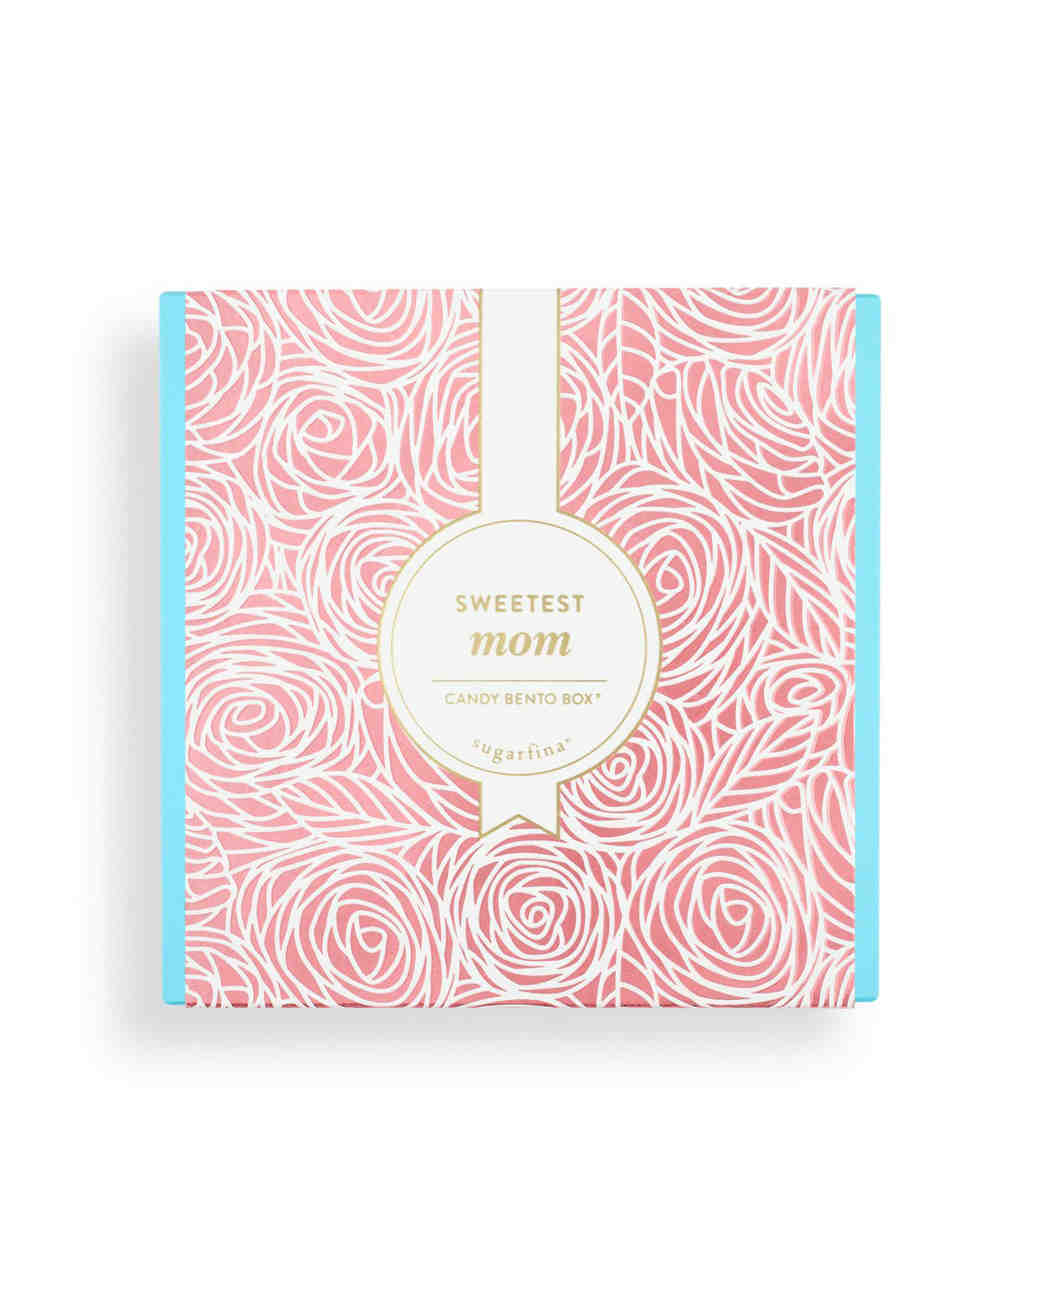 Sugarfina Mother's Day Gift Box